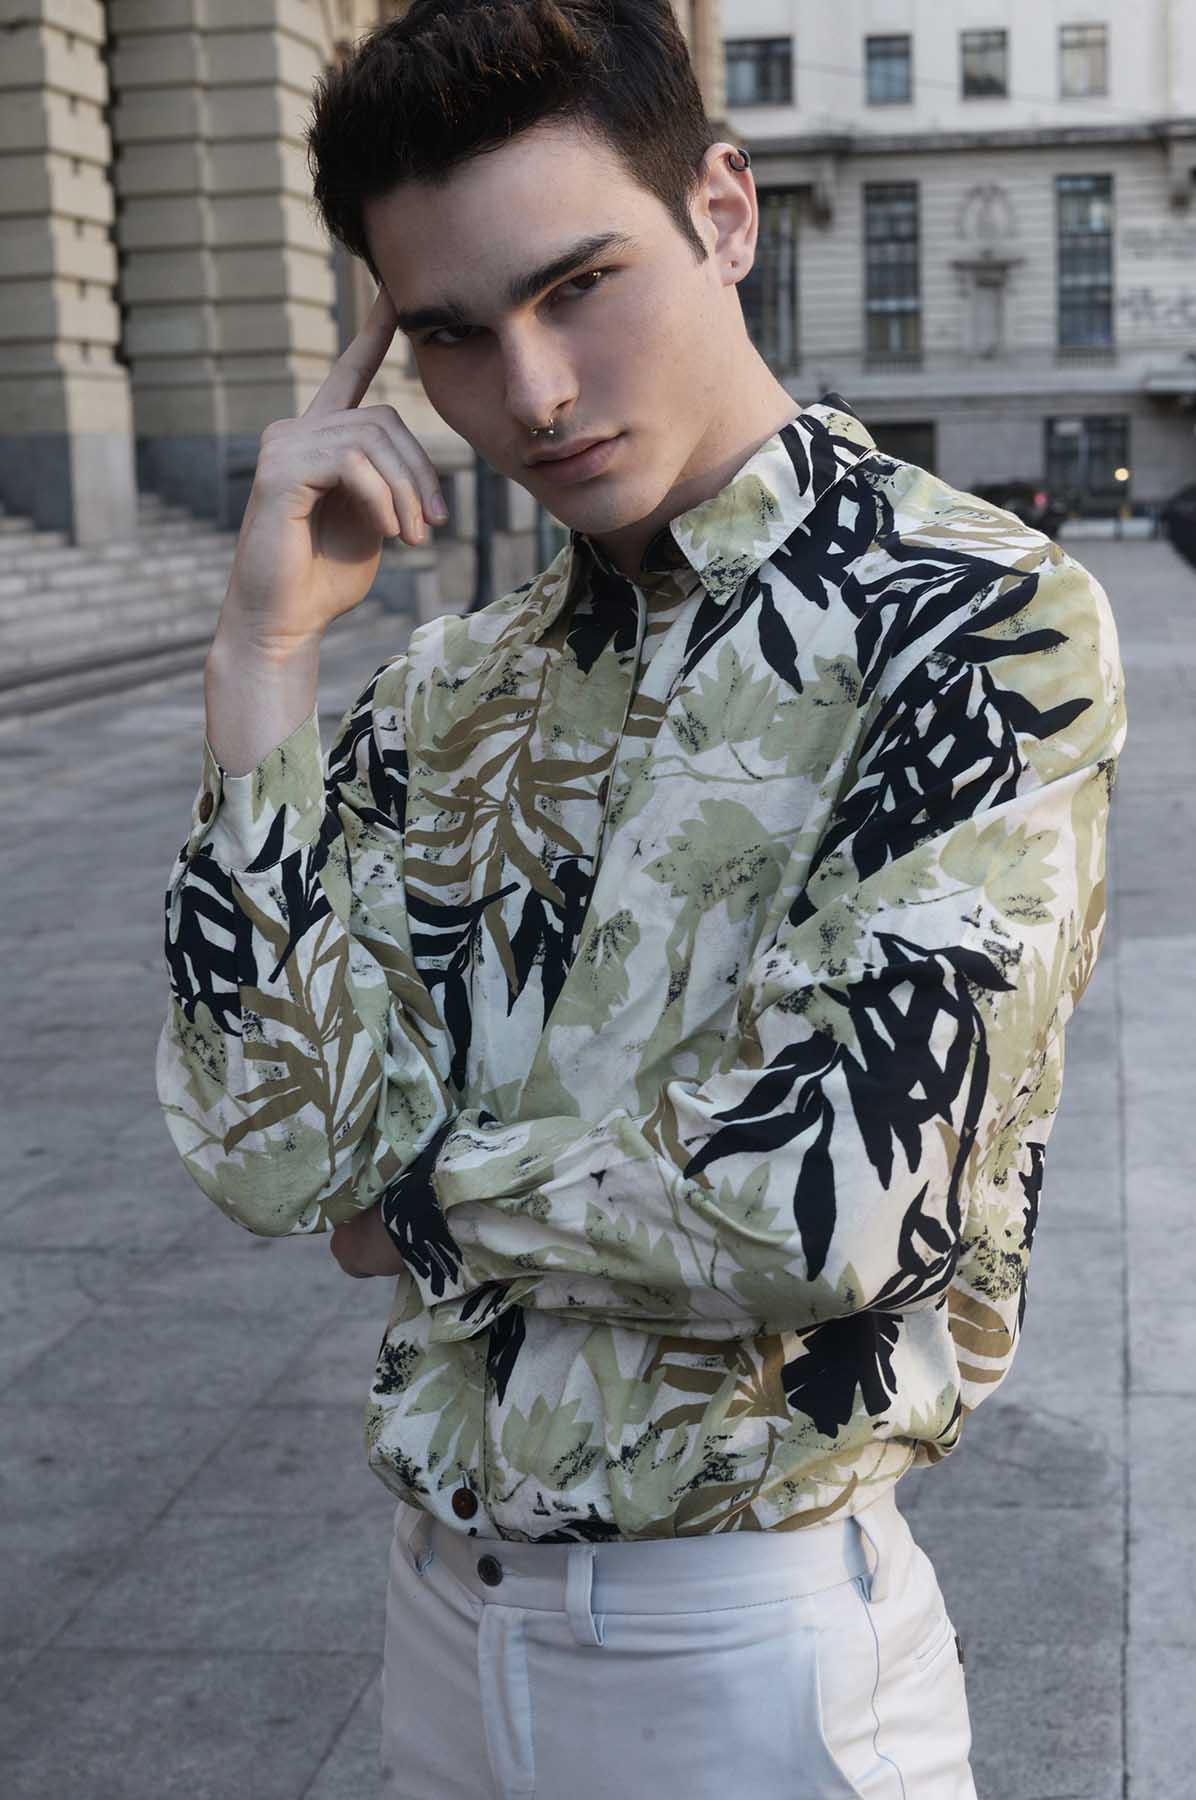 Lucas Feijó by Rodrigo Marconatto for Brazilian Male Model